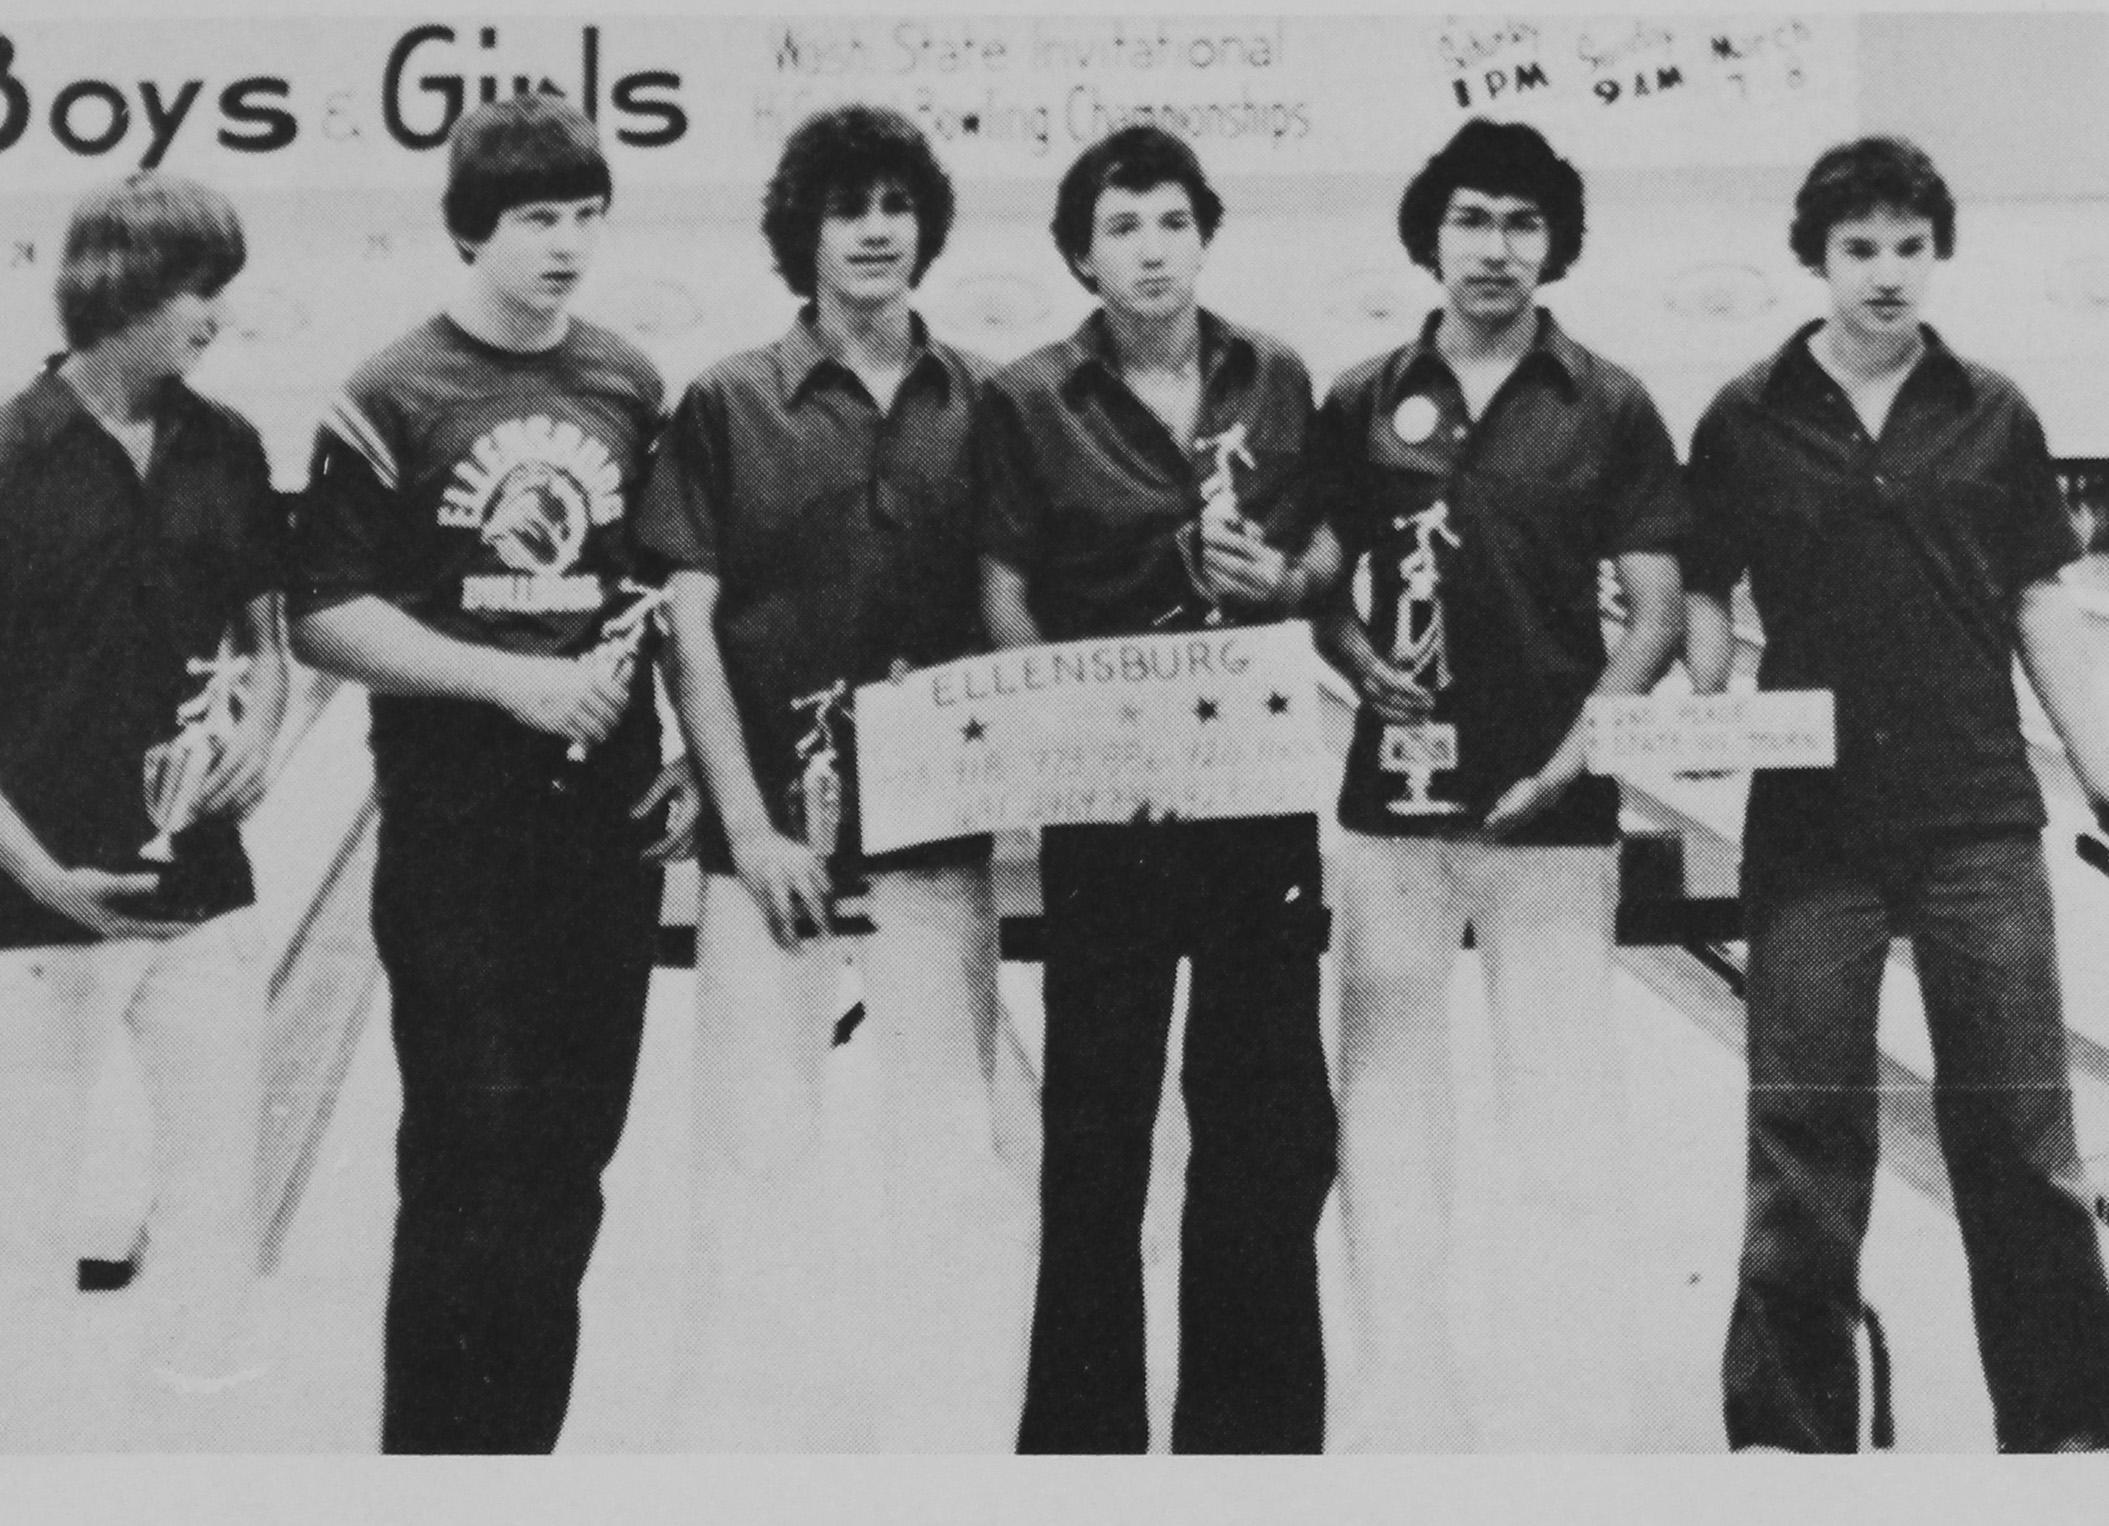 1981 bowling champs